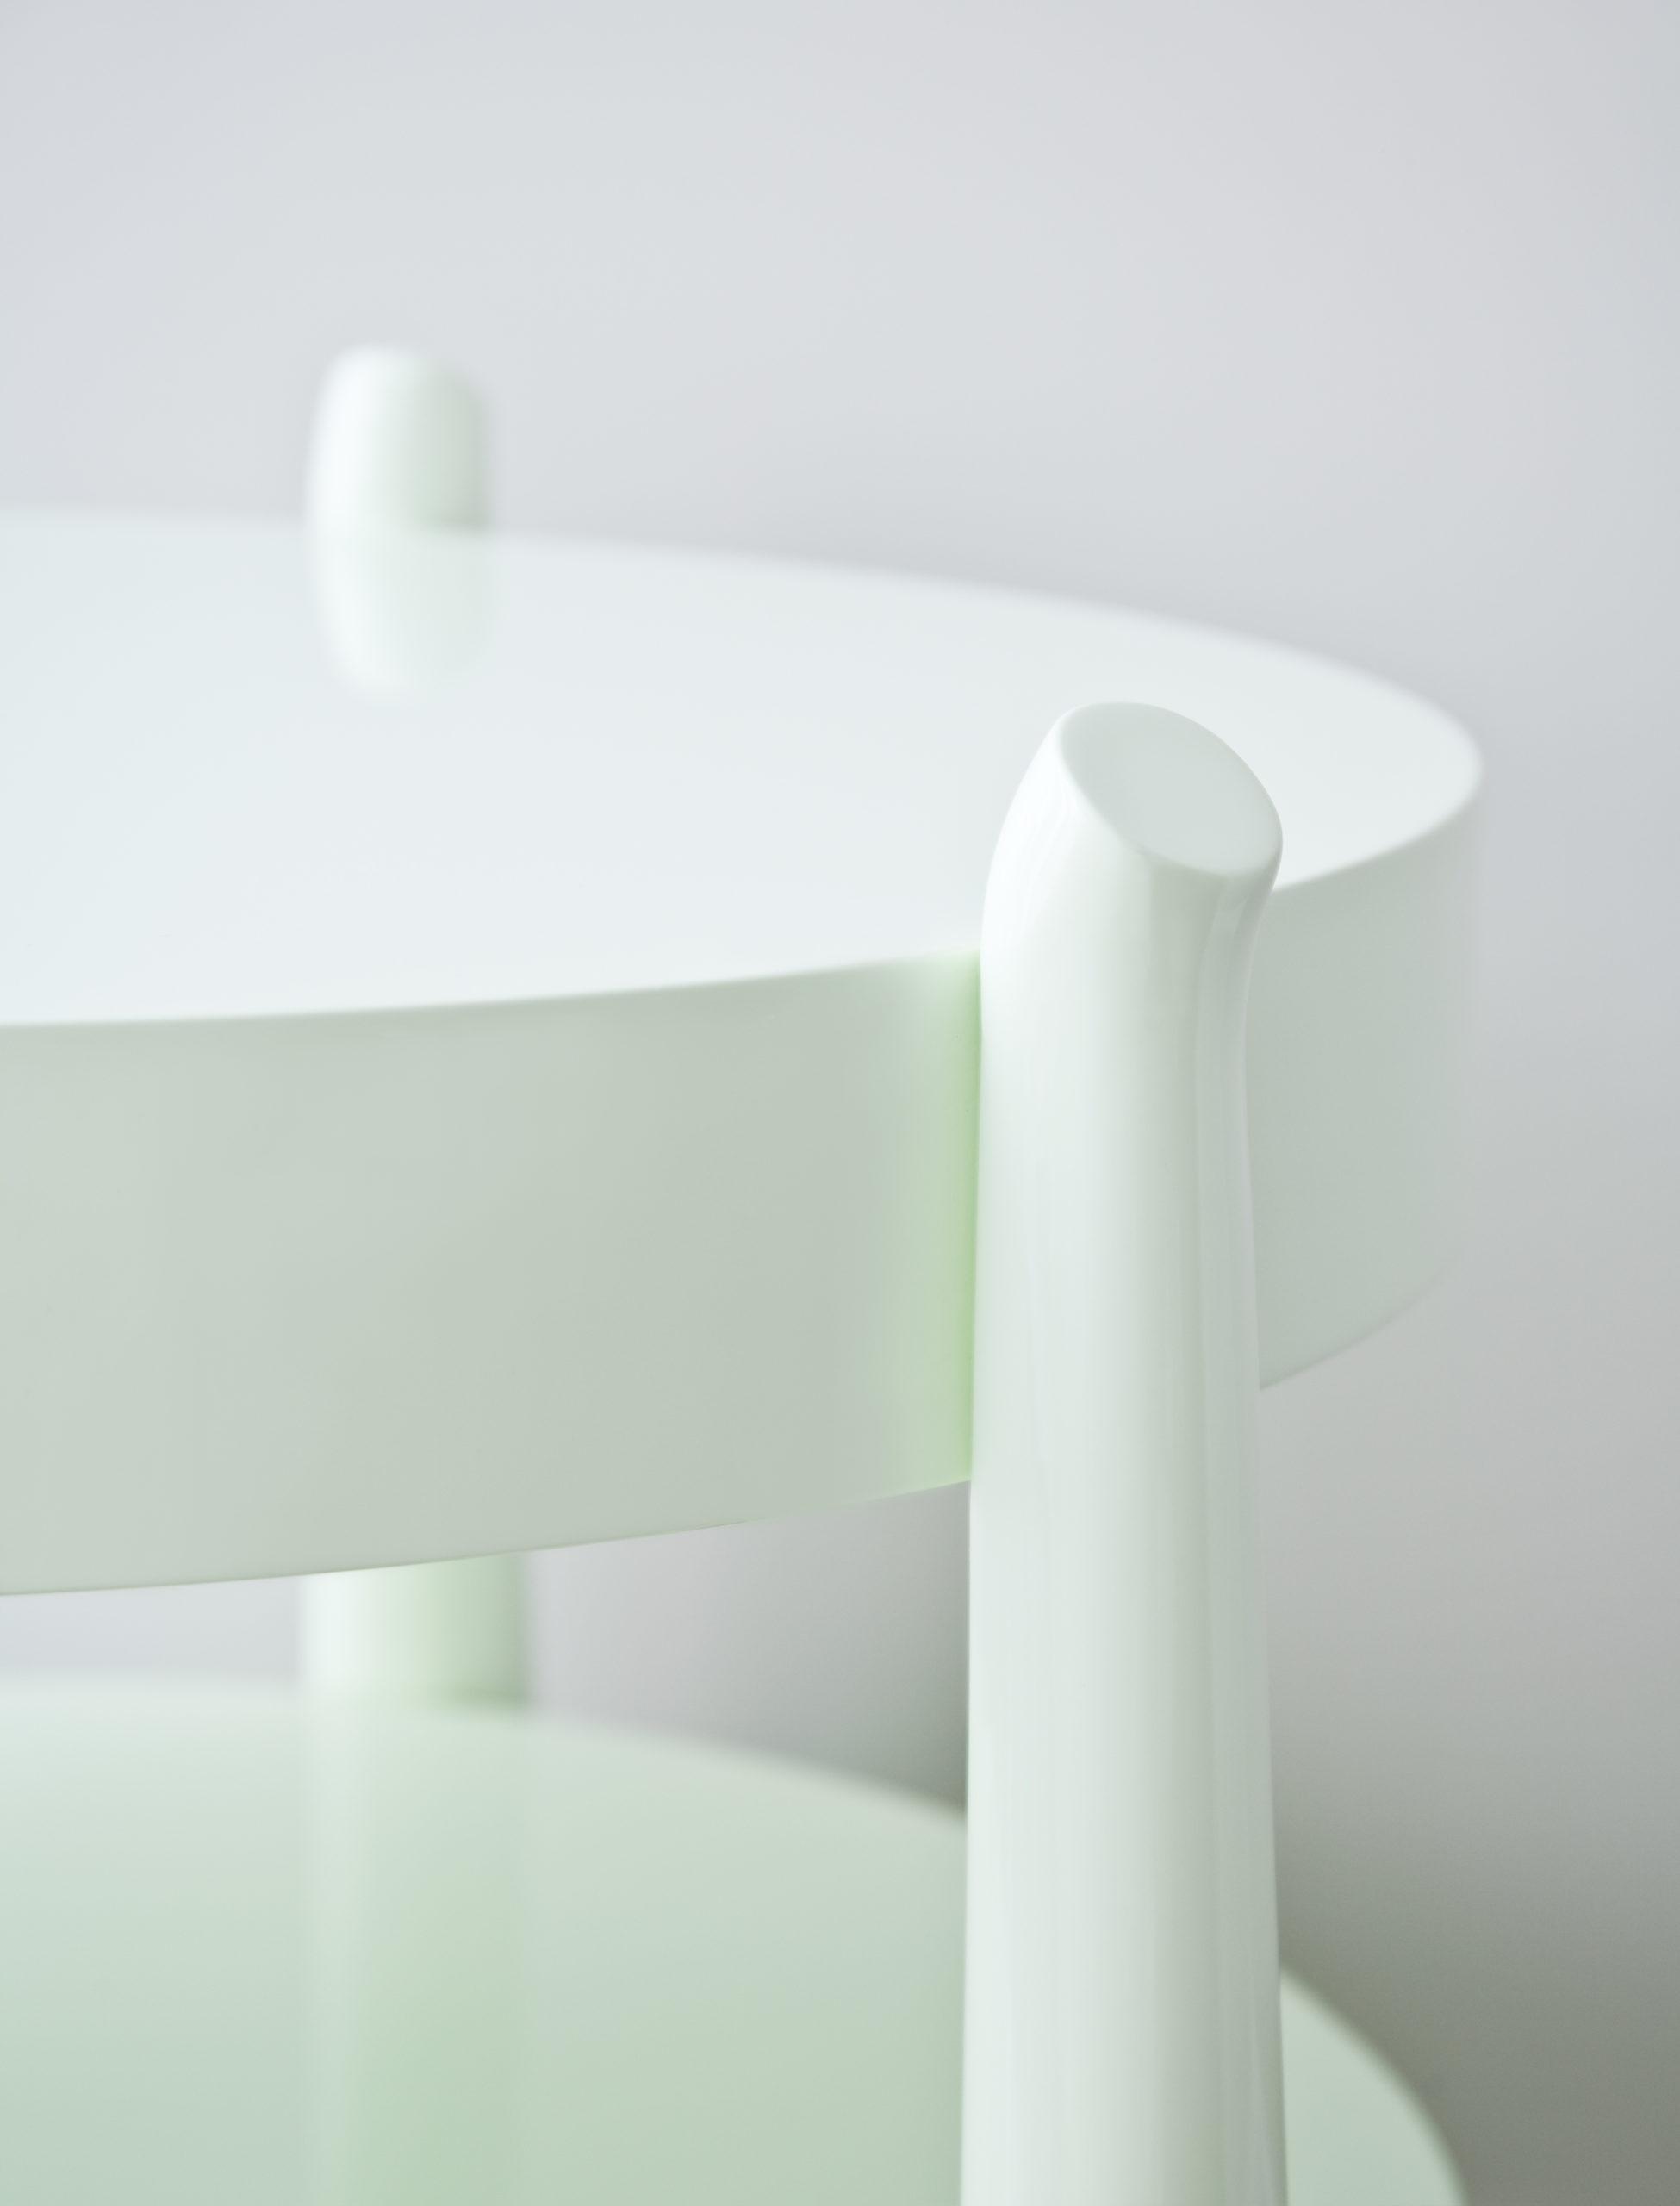 DELIGHT-nightstands-2-nicole-fuller-product-information